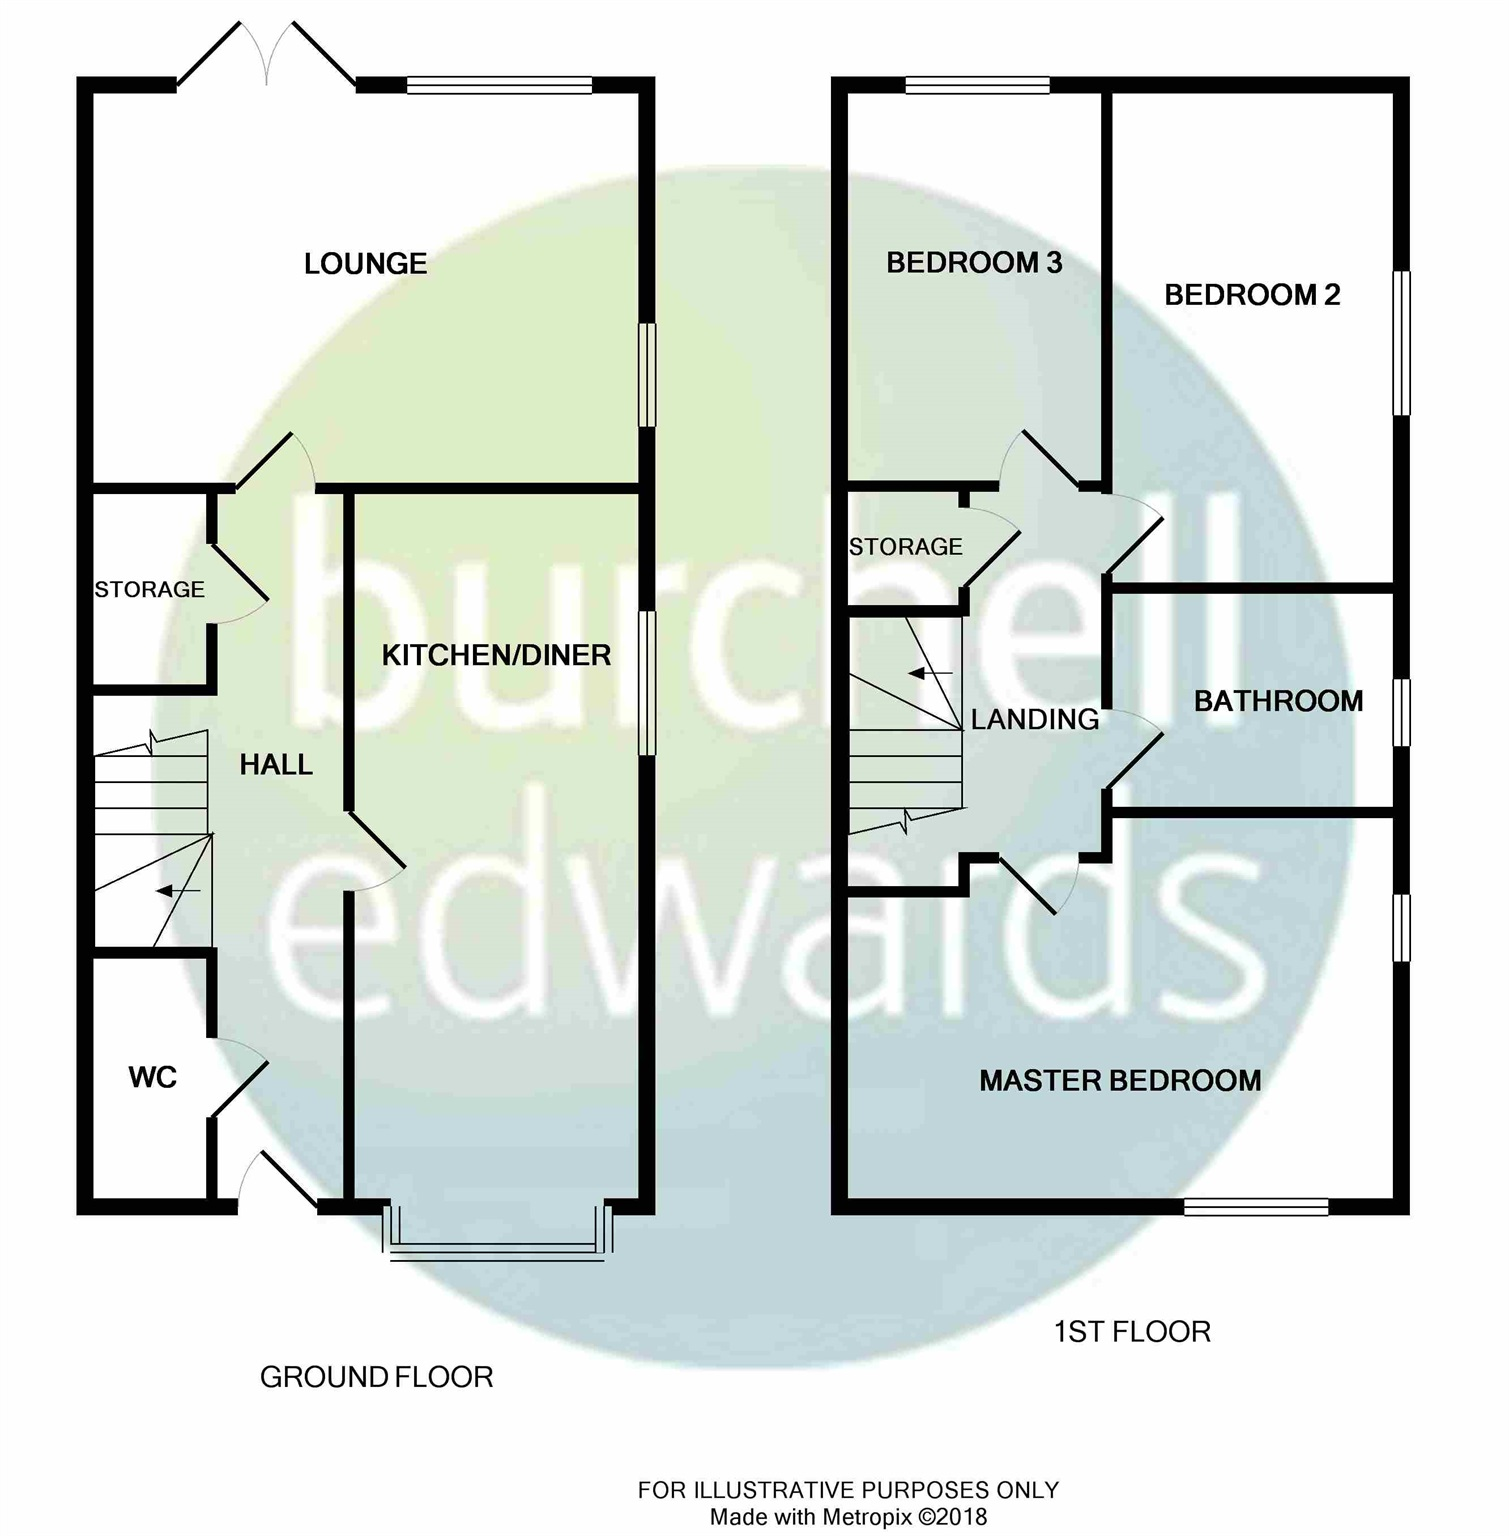 bromford road hodge hill birmingham b36 3 bedroom semi. Black Bedroom Furniture Sets. Home Design Ideas